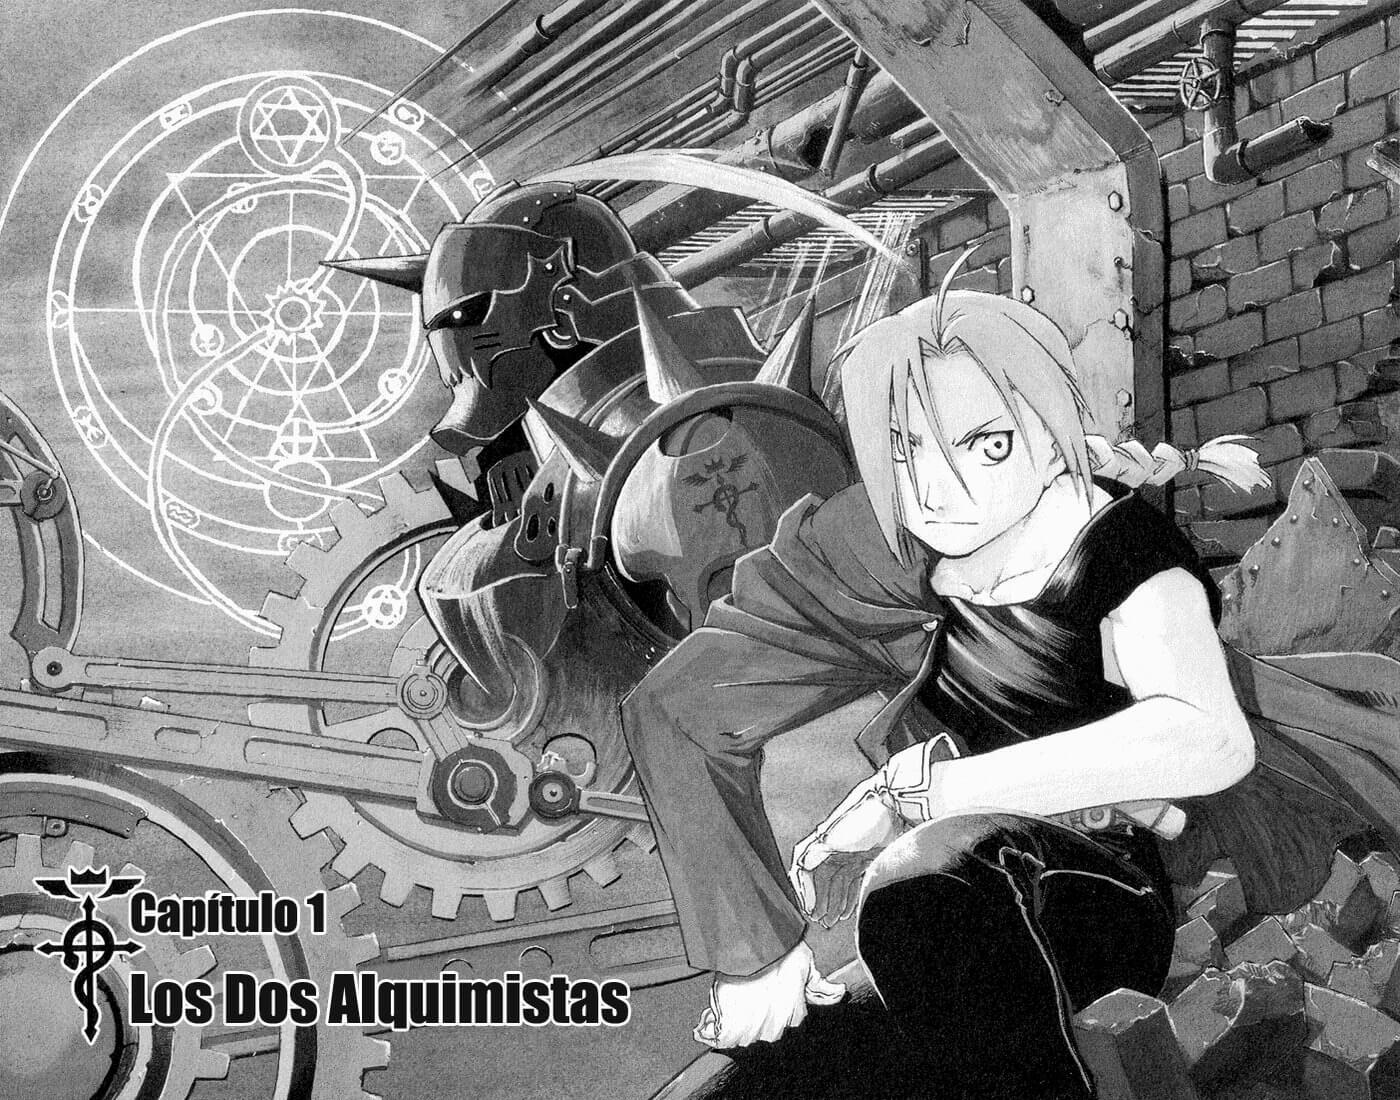 manga full metal alchemist descargar antivirus